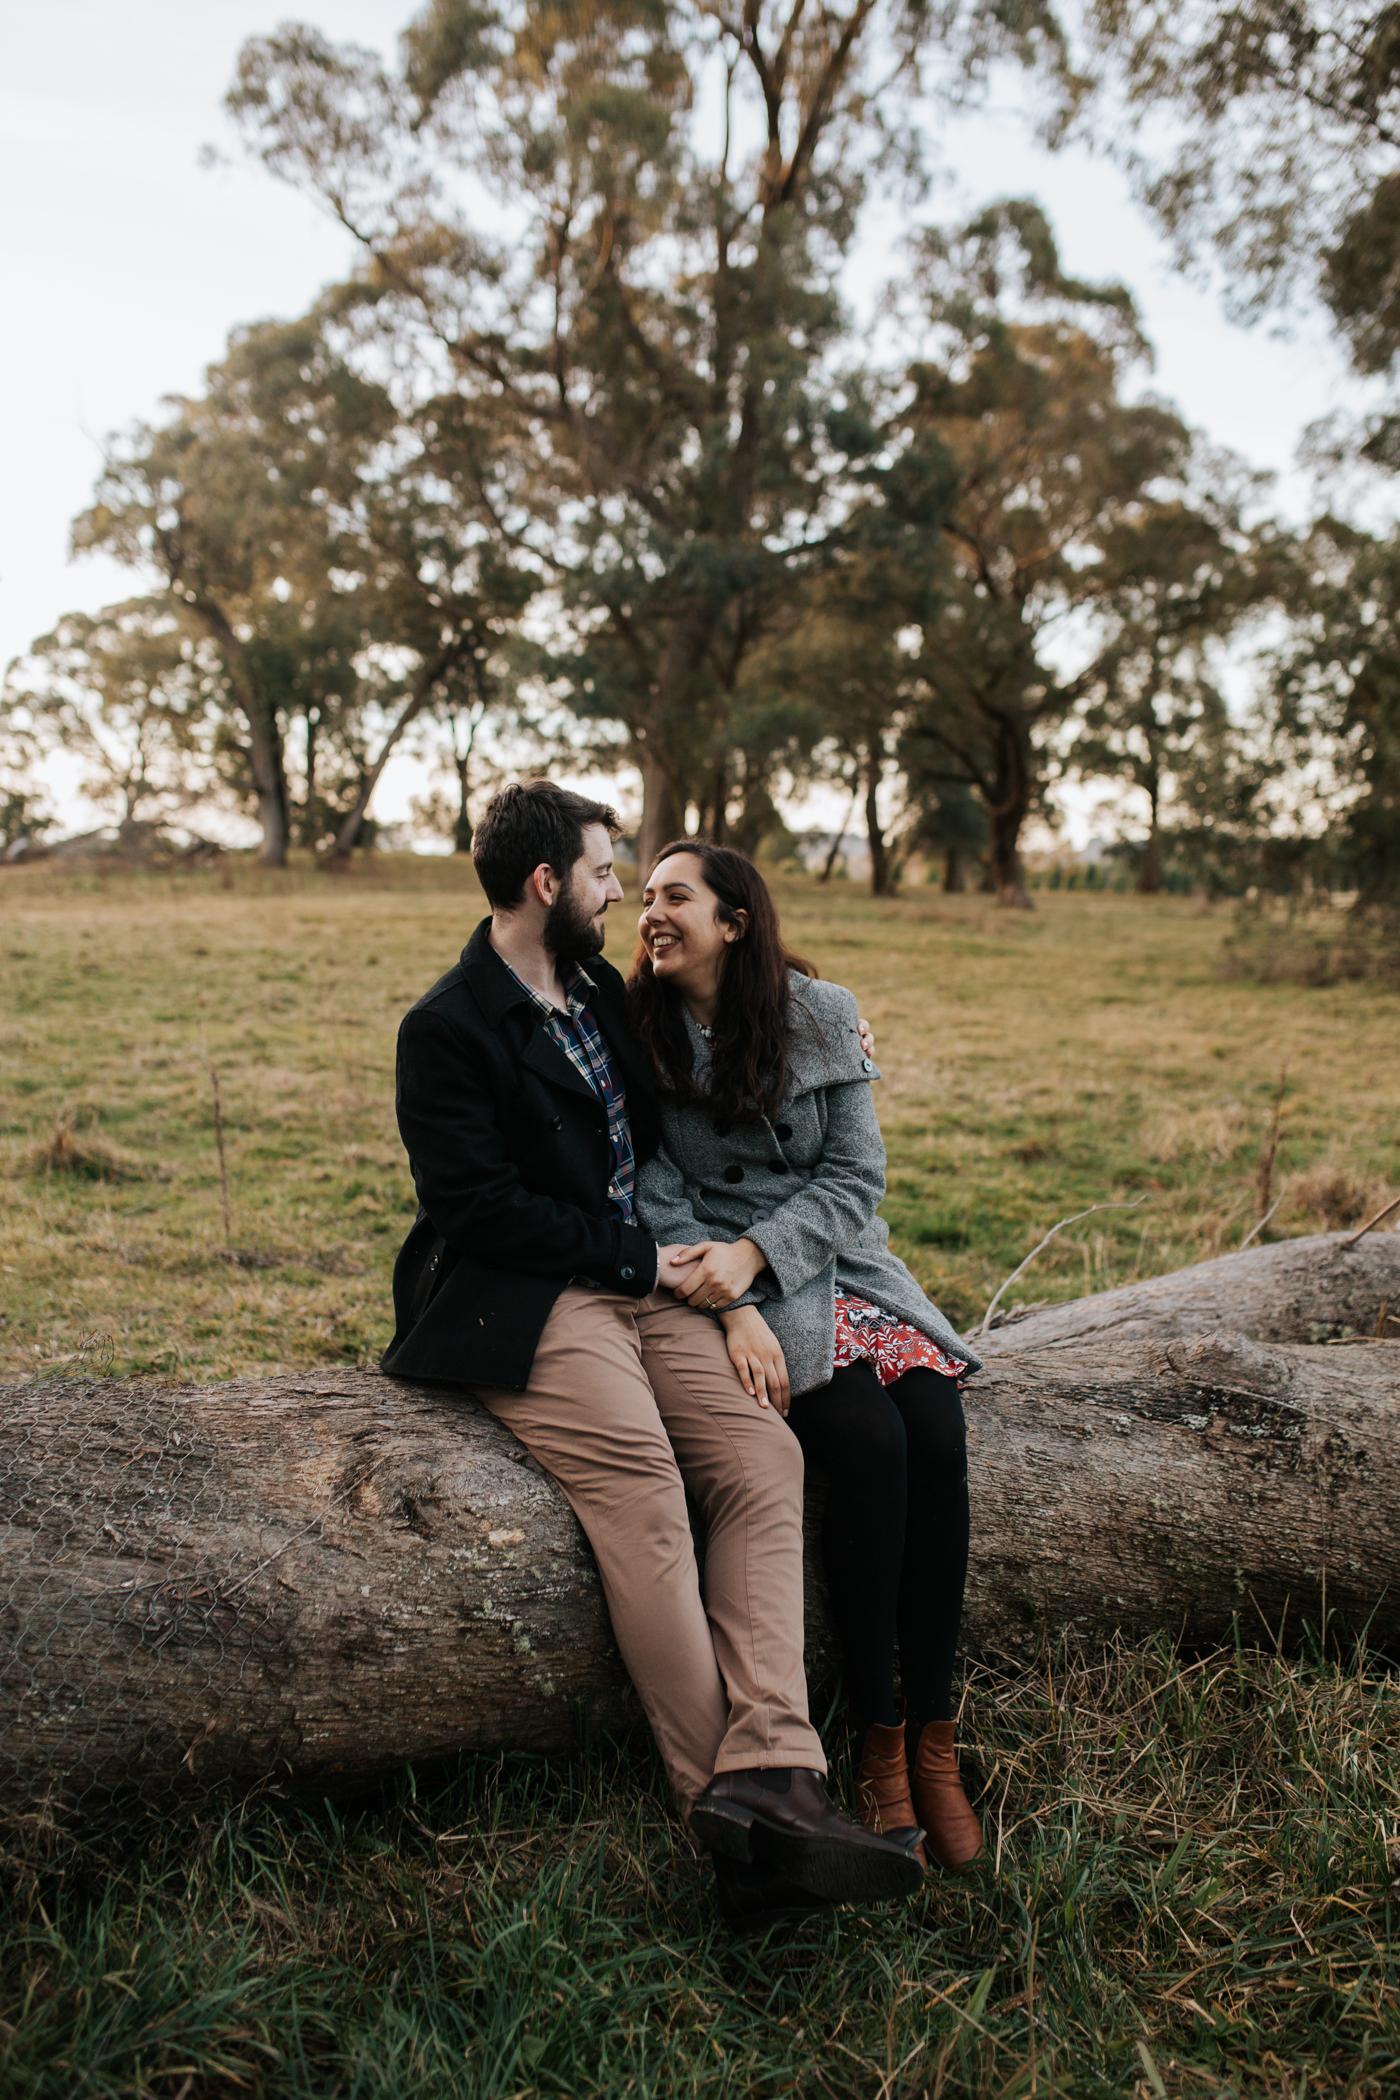 Kate & Kieran - Southern Highlands Engagement - Samantha Heather Photography-67.jpg